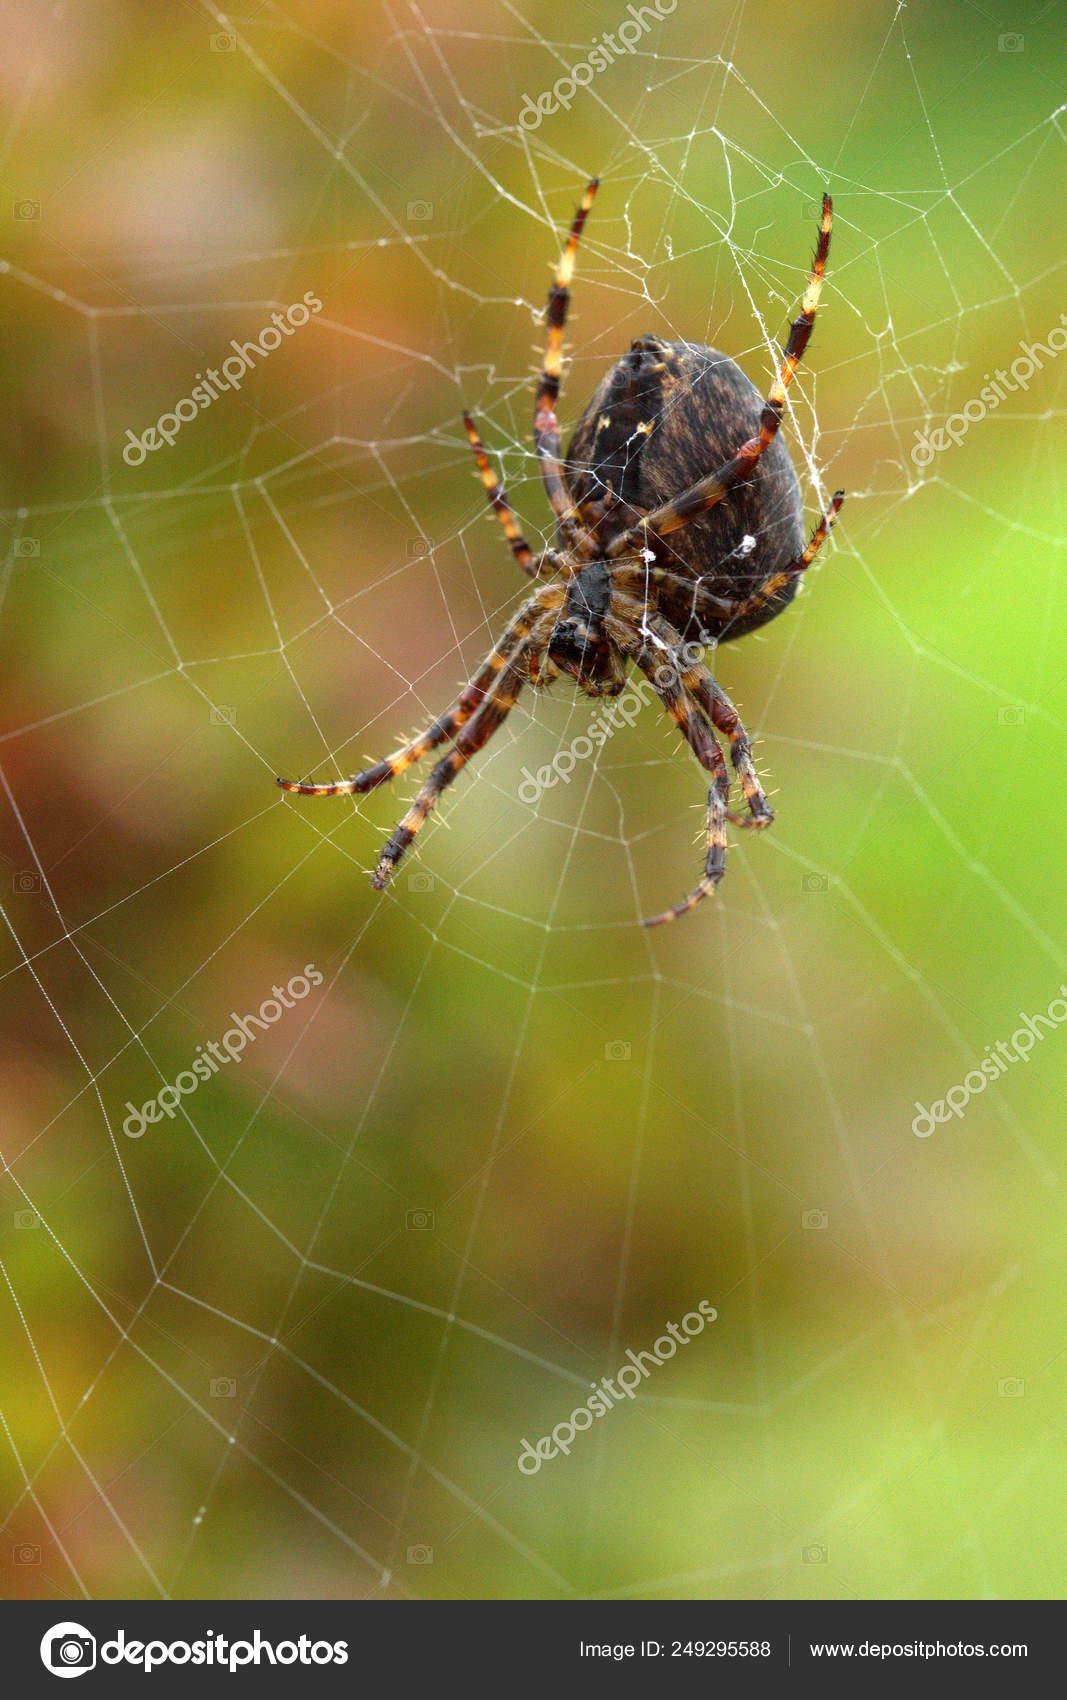 Big Hairy Garden Spider Web Green Mottled Background \u2014 Stock